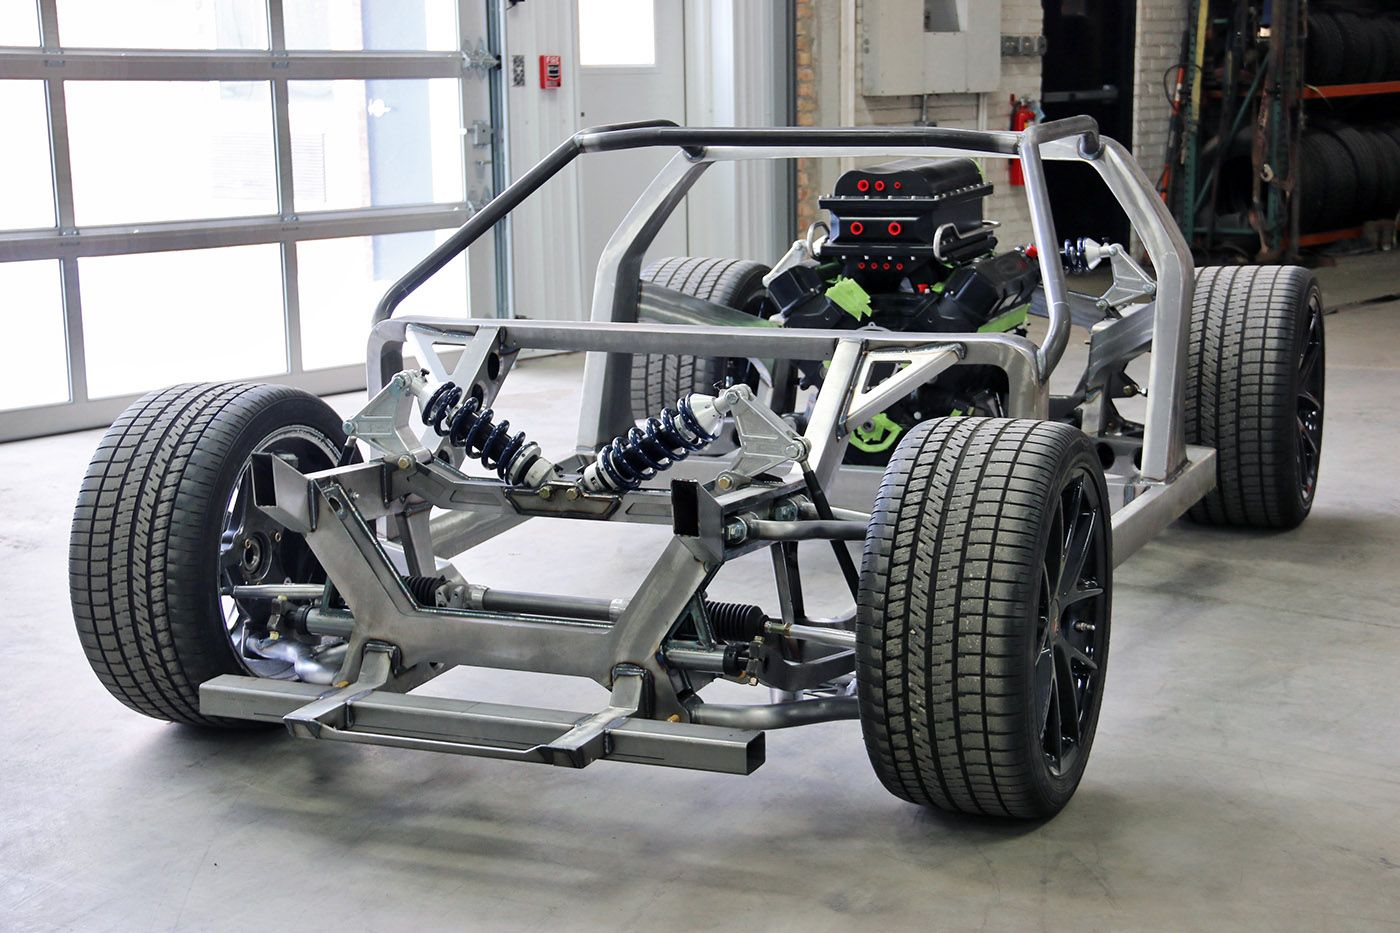 building a pantera with a twin turbo 428 windsor suspension voitures et moto. Black Bedroom Furniture Sets. Home Design Ideas